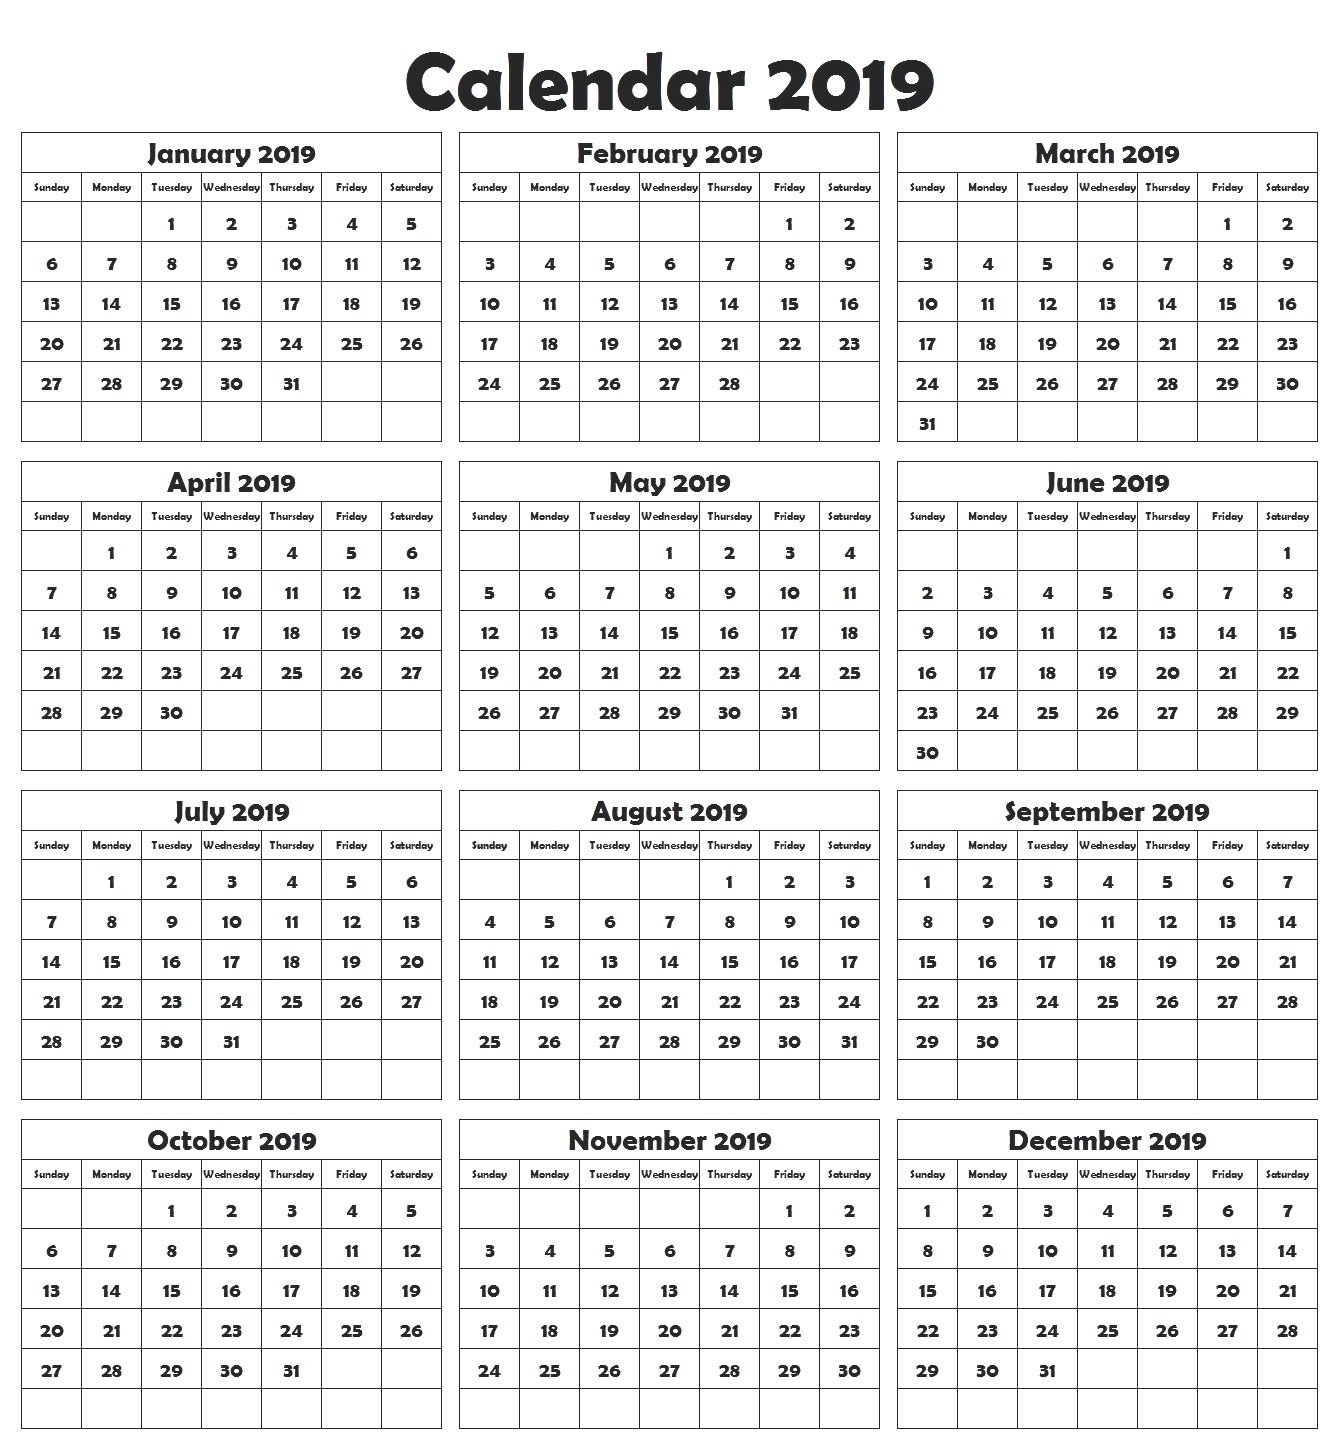 Large Printable Yearly Calendar 2019 – Free Calendar Templates Calendar 2019 Large Print